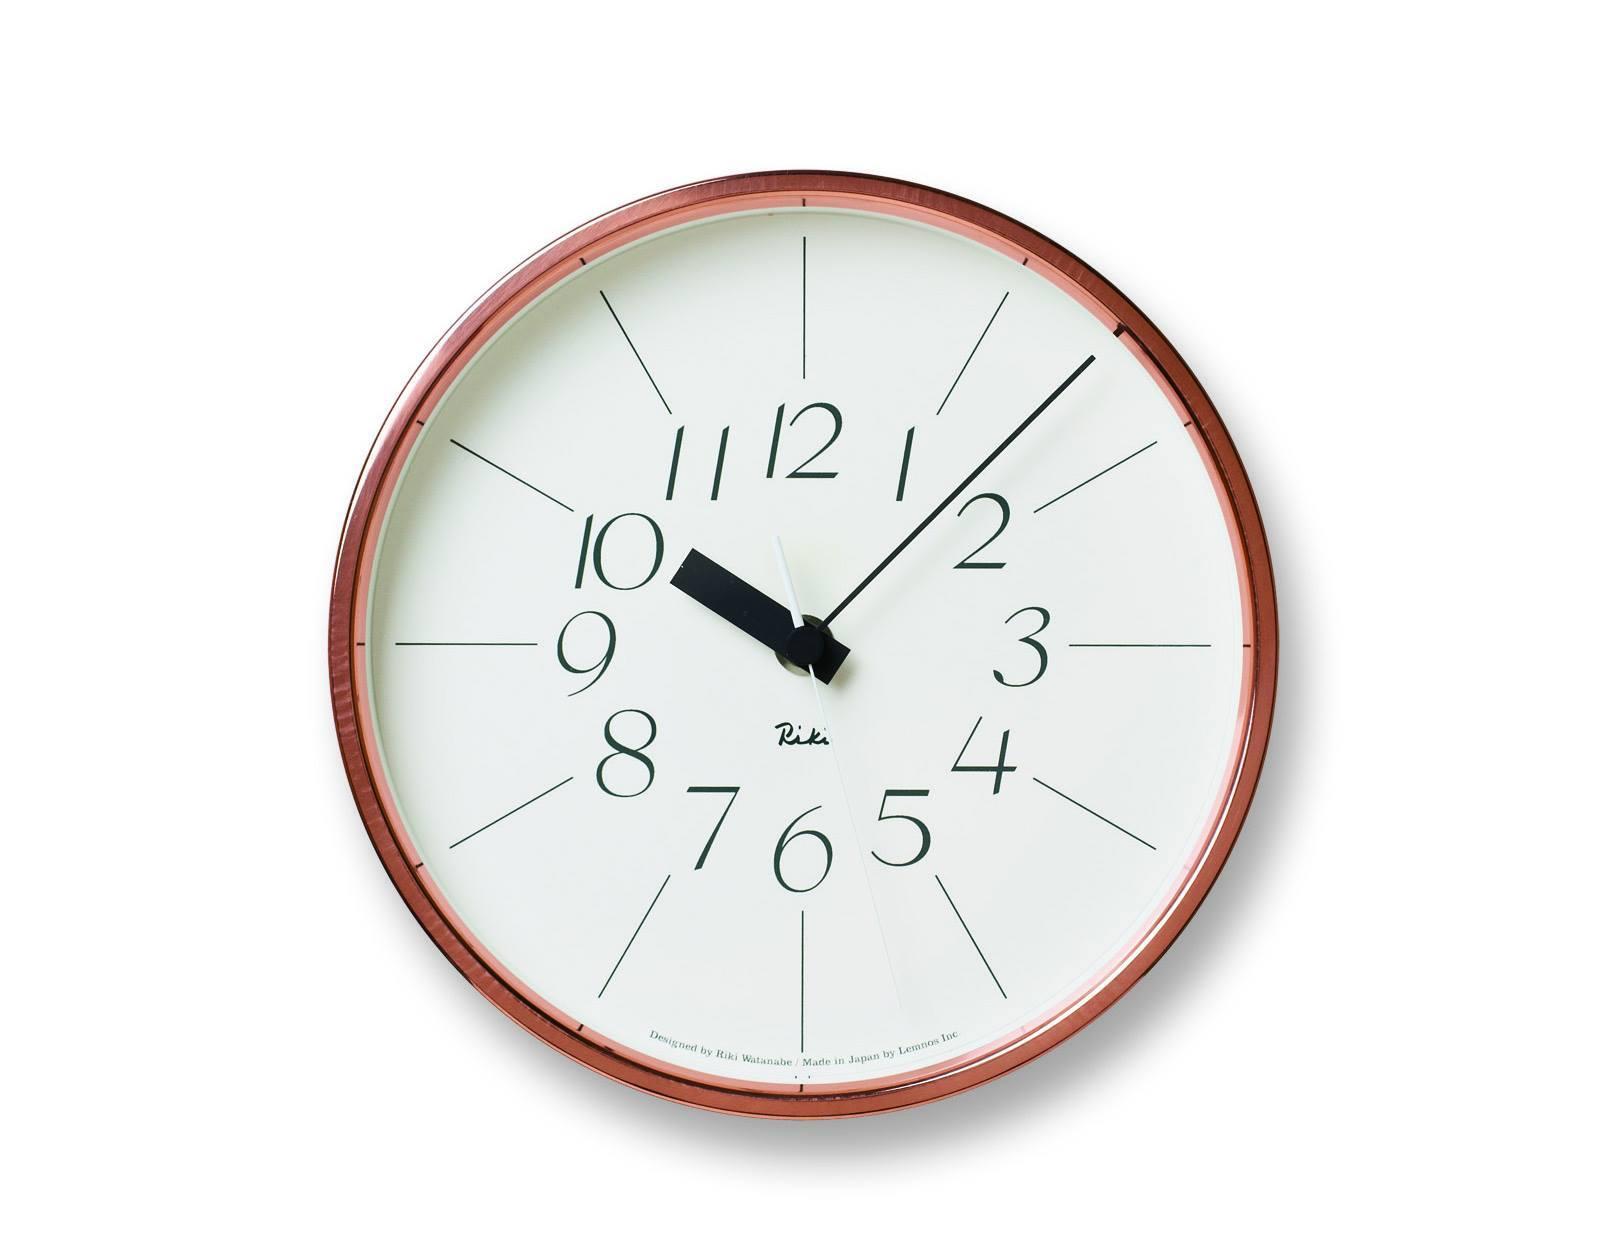 2019 X'mas GIFT Vol.7...渡辺力がもっとも愛する金属であった銅を用いた時計の名作。_b0125570_16045031.jpg